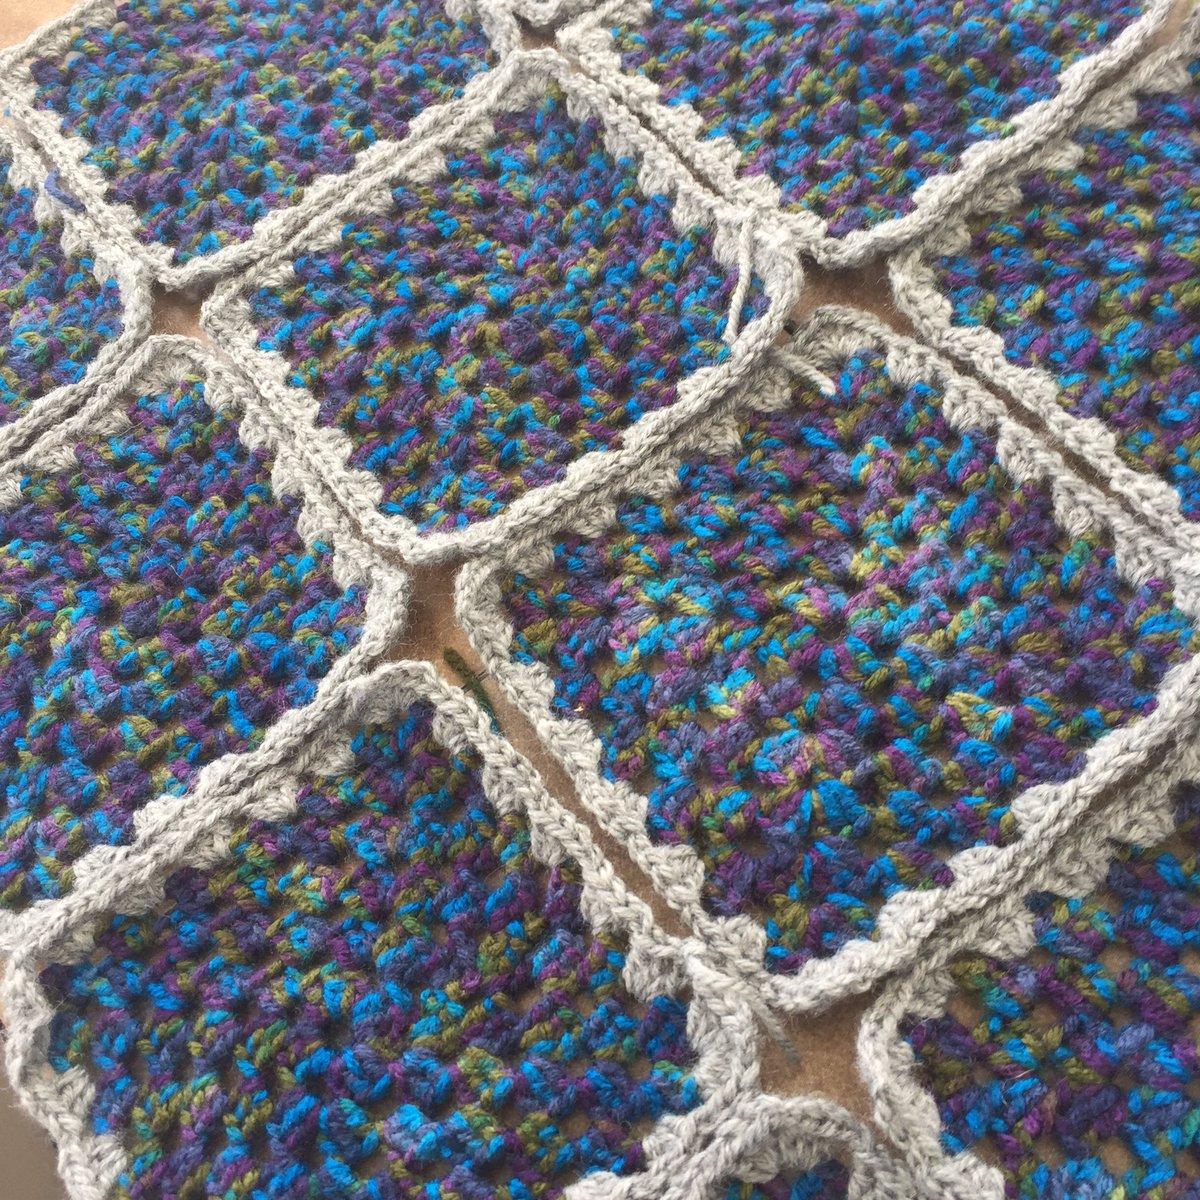 My #blanket is coming along slowly! #crochet<br>http://pic.twitter.com/hoFxnUiU1R